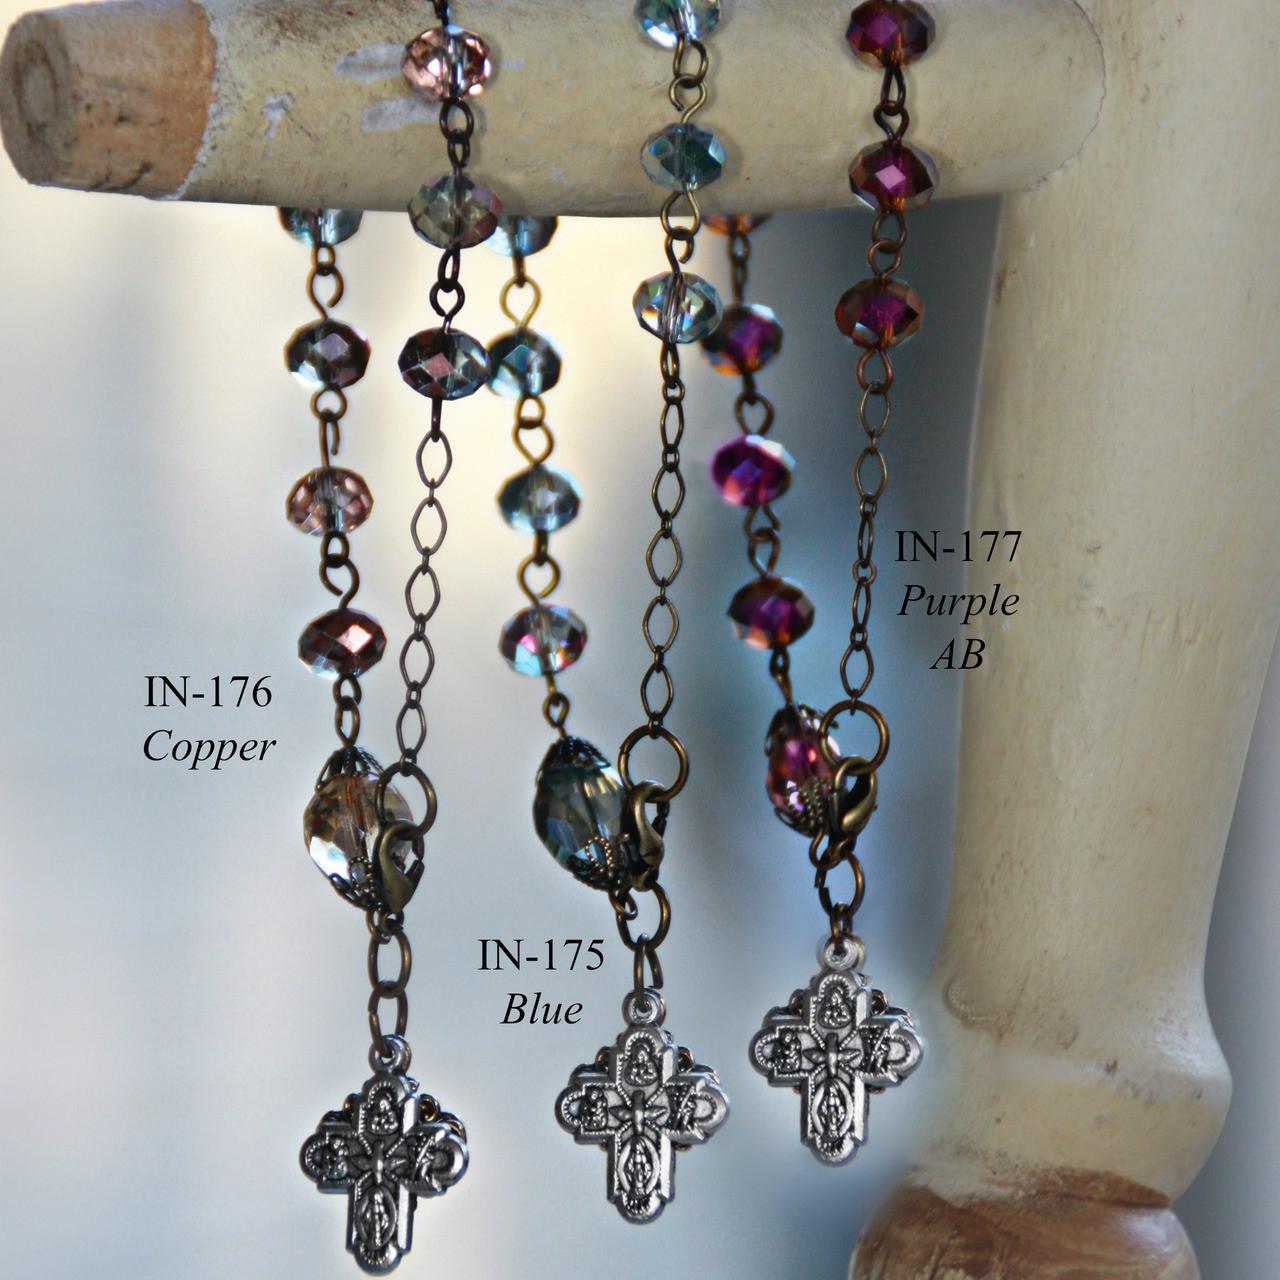 IN-175 Gorgeous Blues Rosary Bracelet